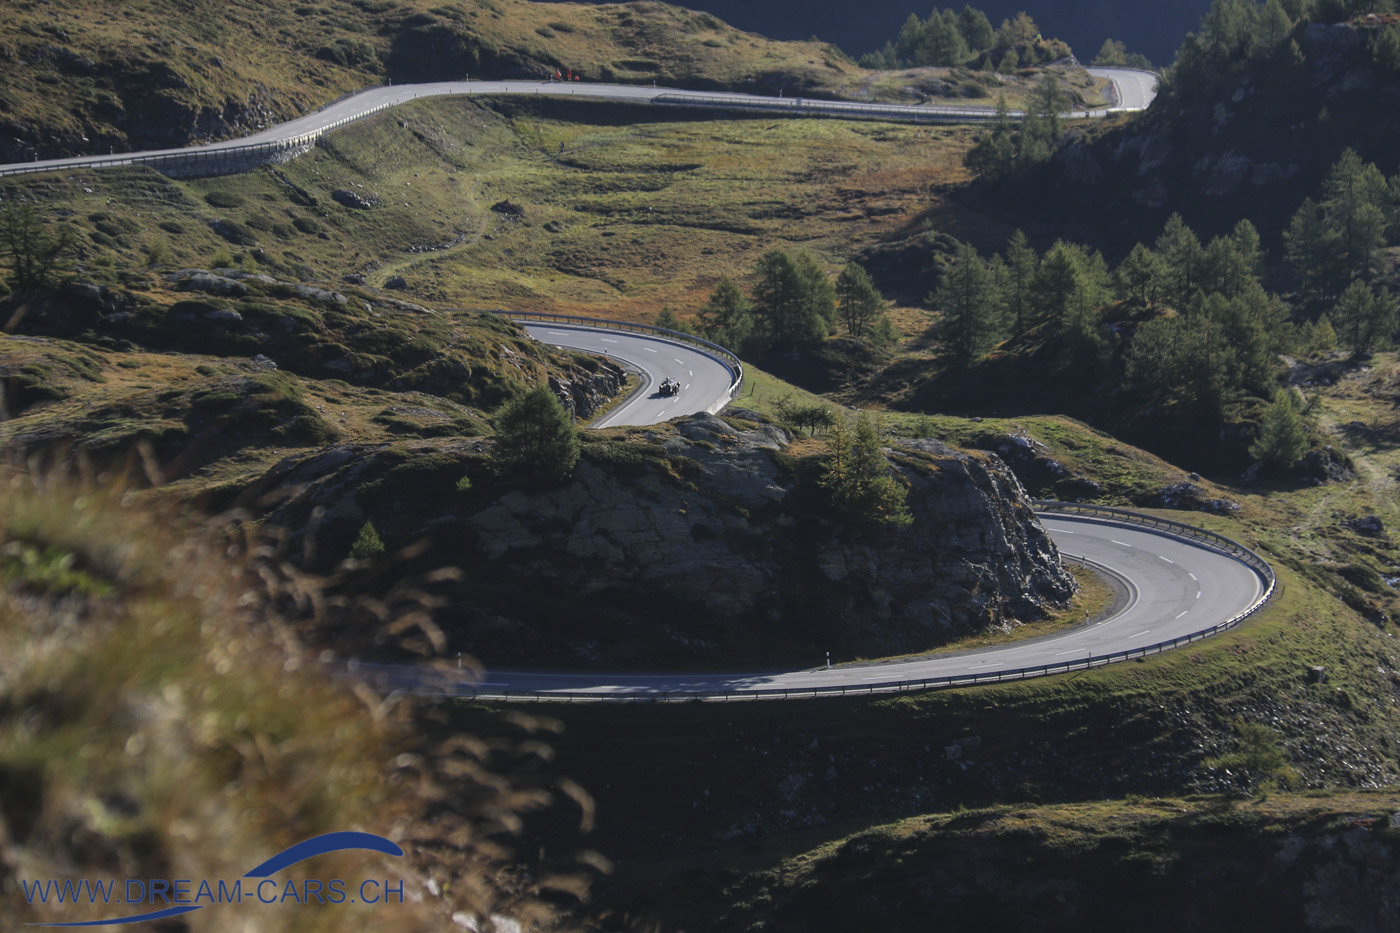 Bernina Gran Turismo, 17. - 19. September 2021. Die Strecke am Berninapass lässt keine Wünsche offen